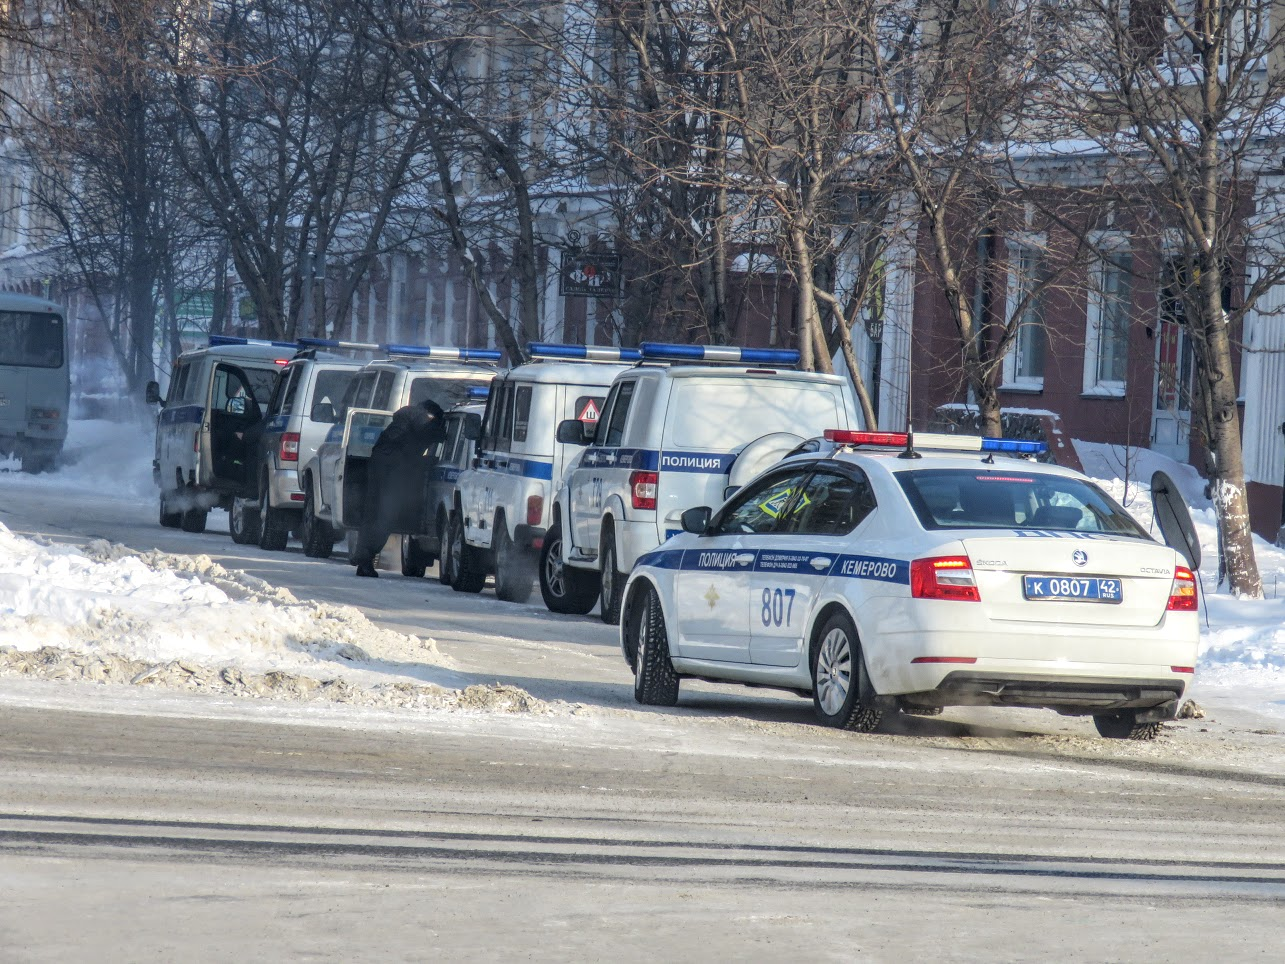 Транспорт не ходит - трамваи, троллейбусы. Полиция, люди, автозаки по городу IMG 1795